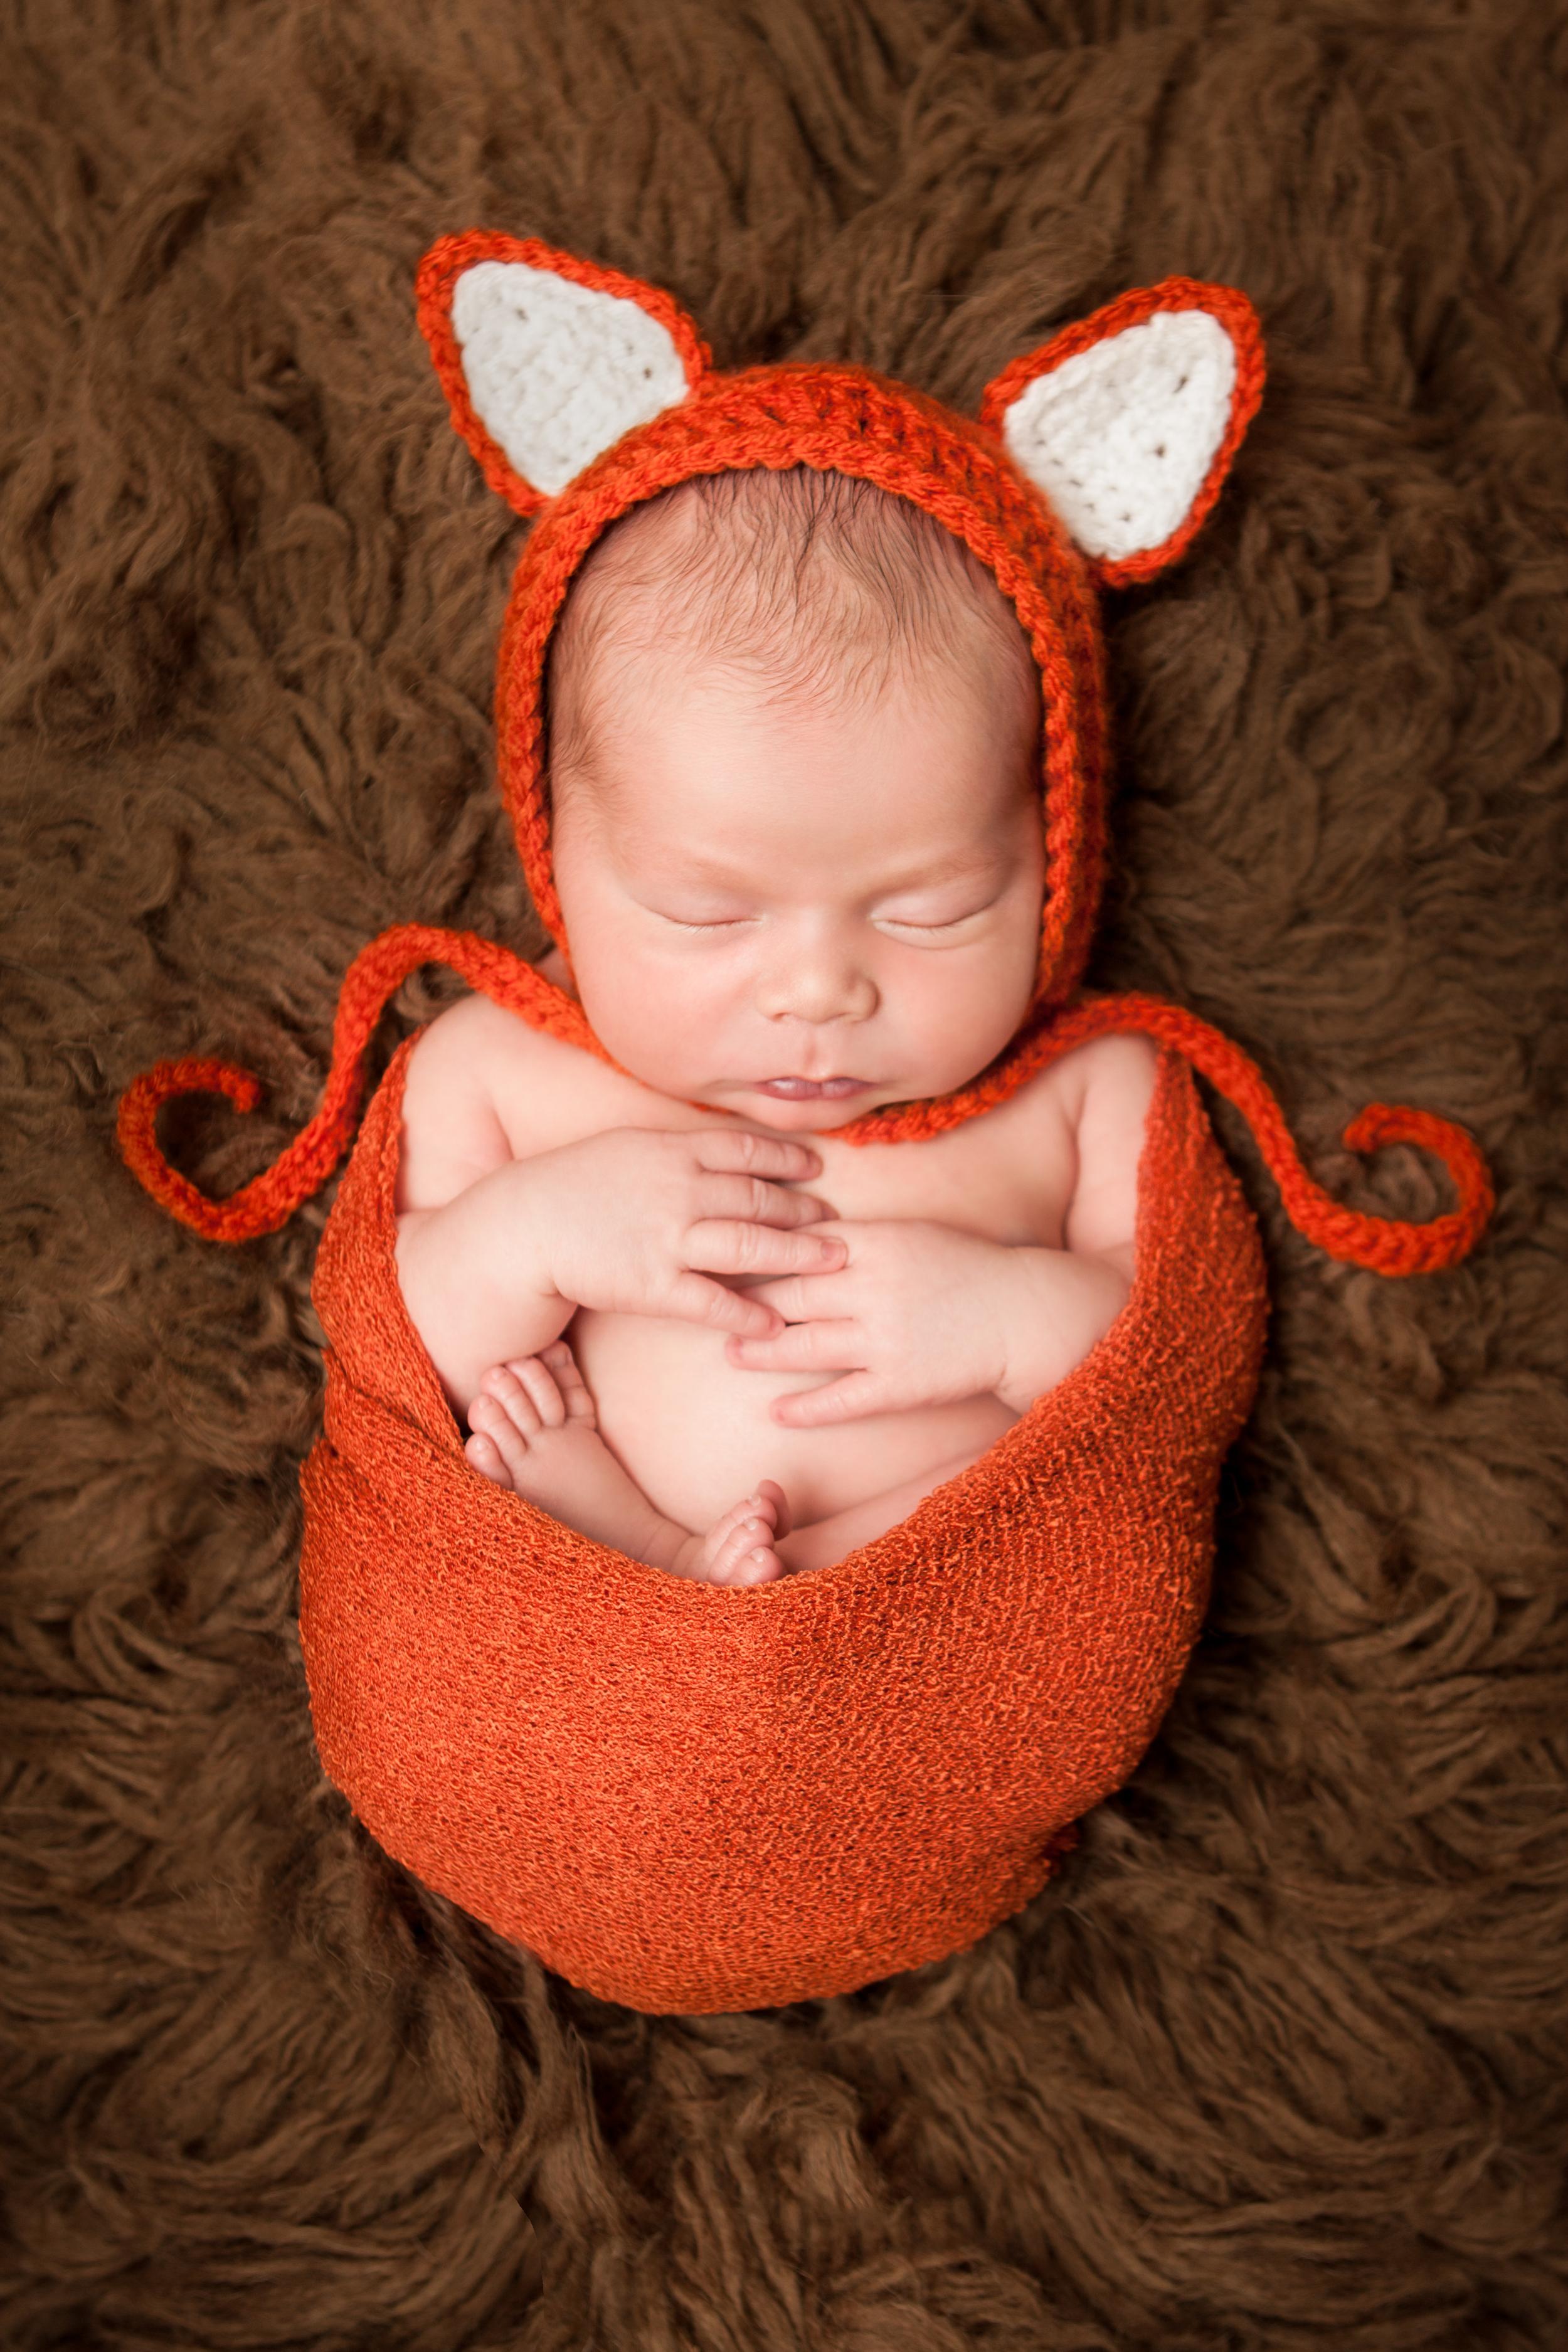 Newborn baby boy chubby orange crochet fox bonnet, orange stretch knit wrap on brown flokati rug,Westchester County, New York newborn photographer, Amanda Noelle Photography.